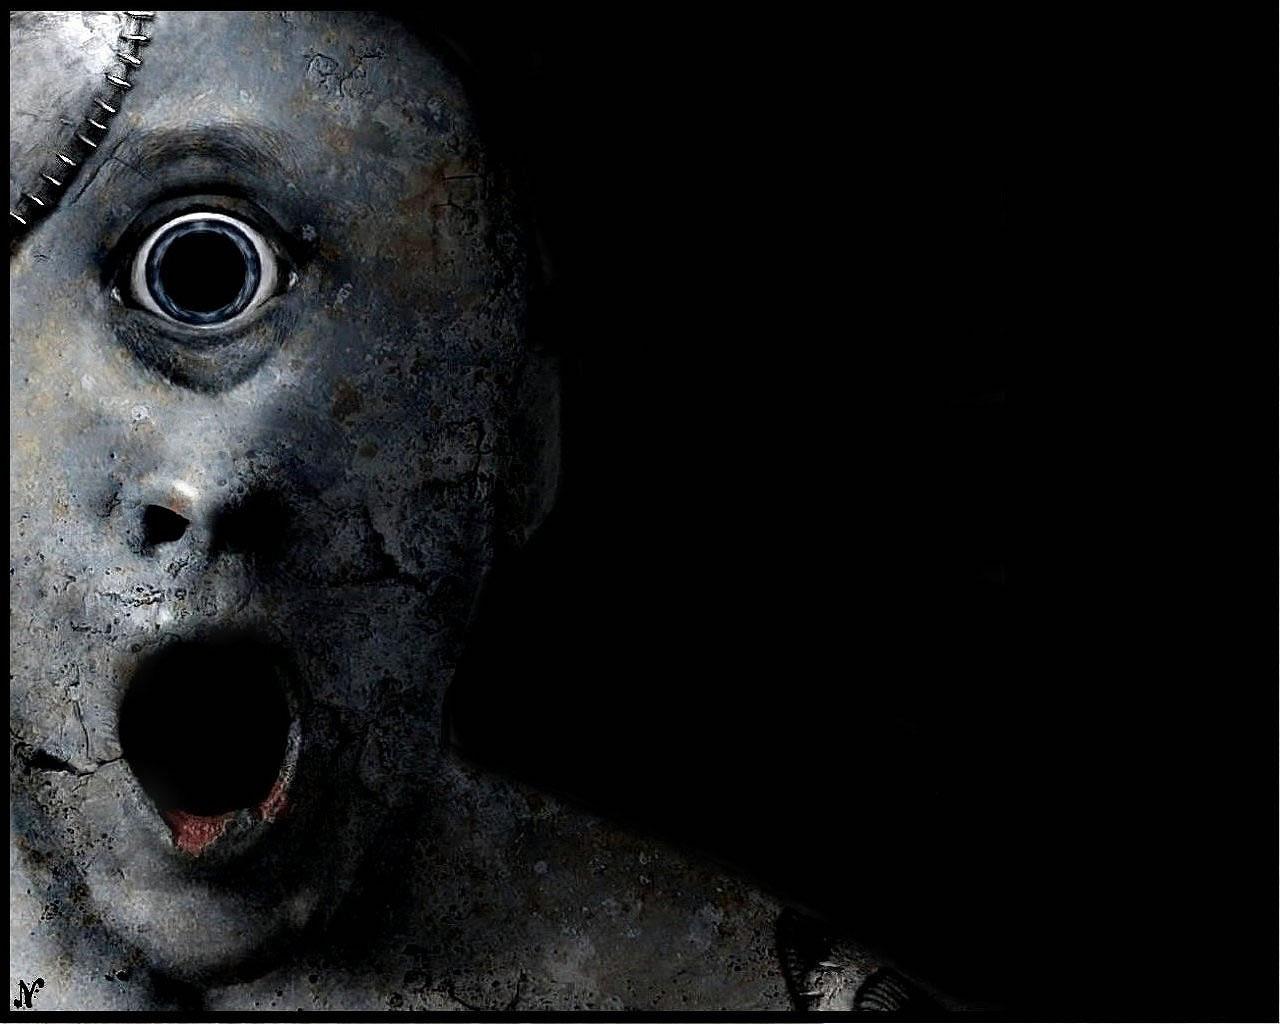 horror eye wallpaper hd - photo #24